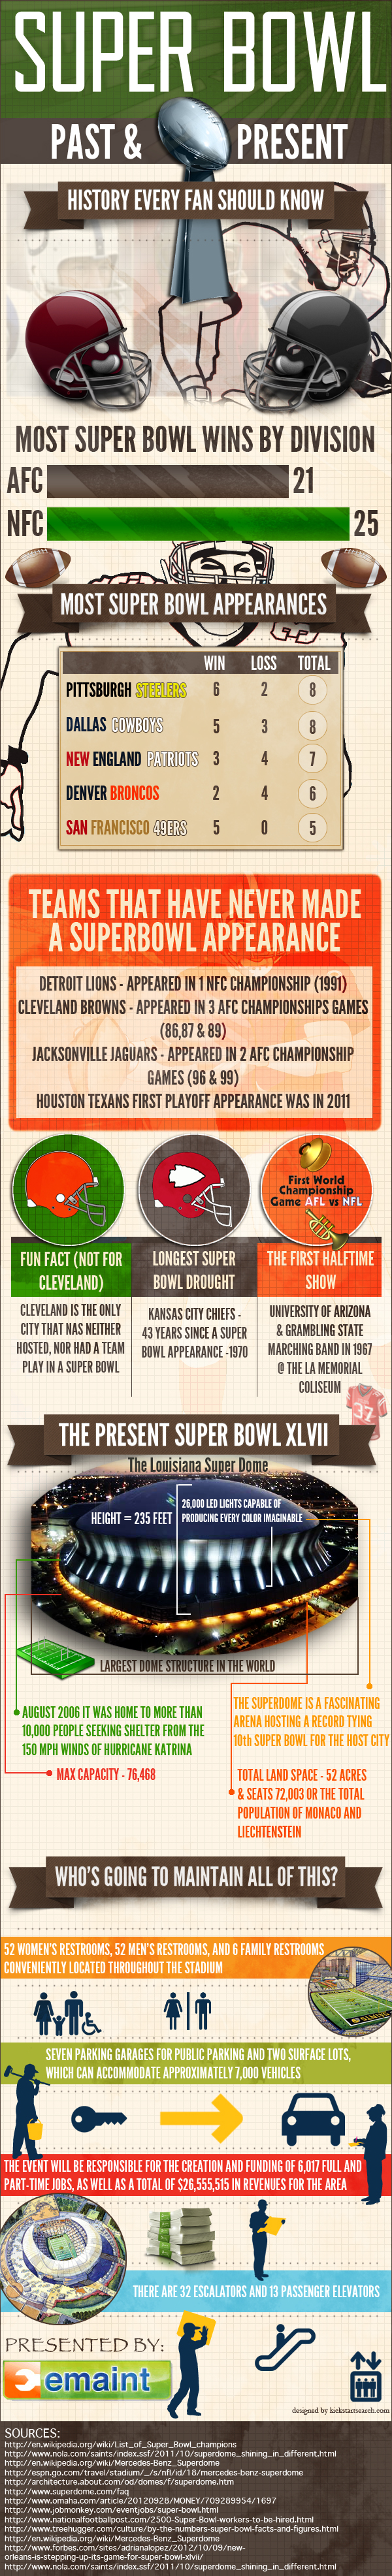 Super Bowl XLVII Infographic